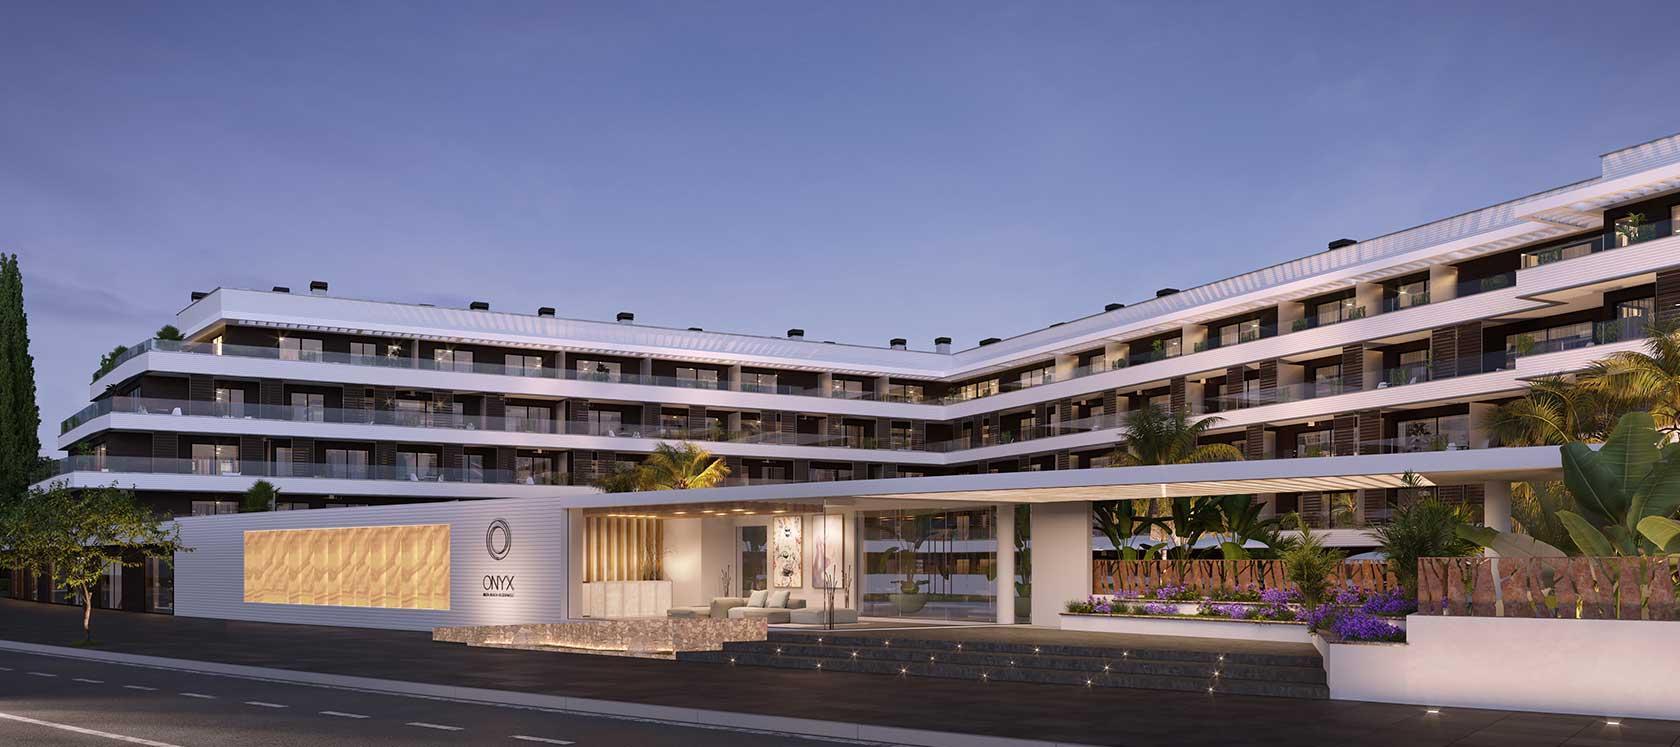 onyx-ibiza-beach-residence